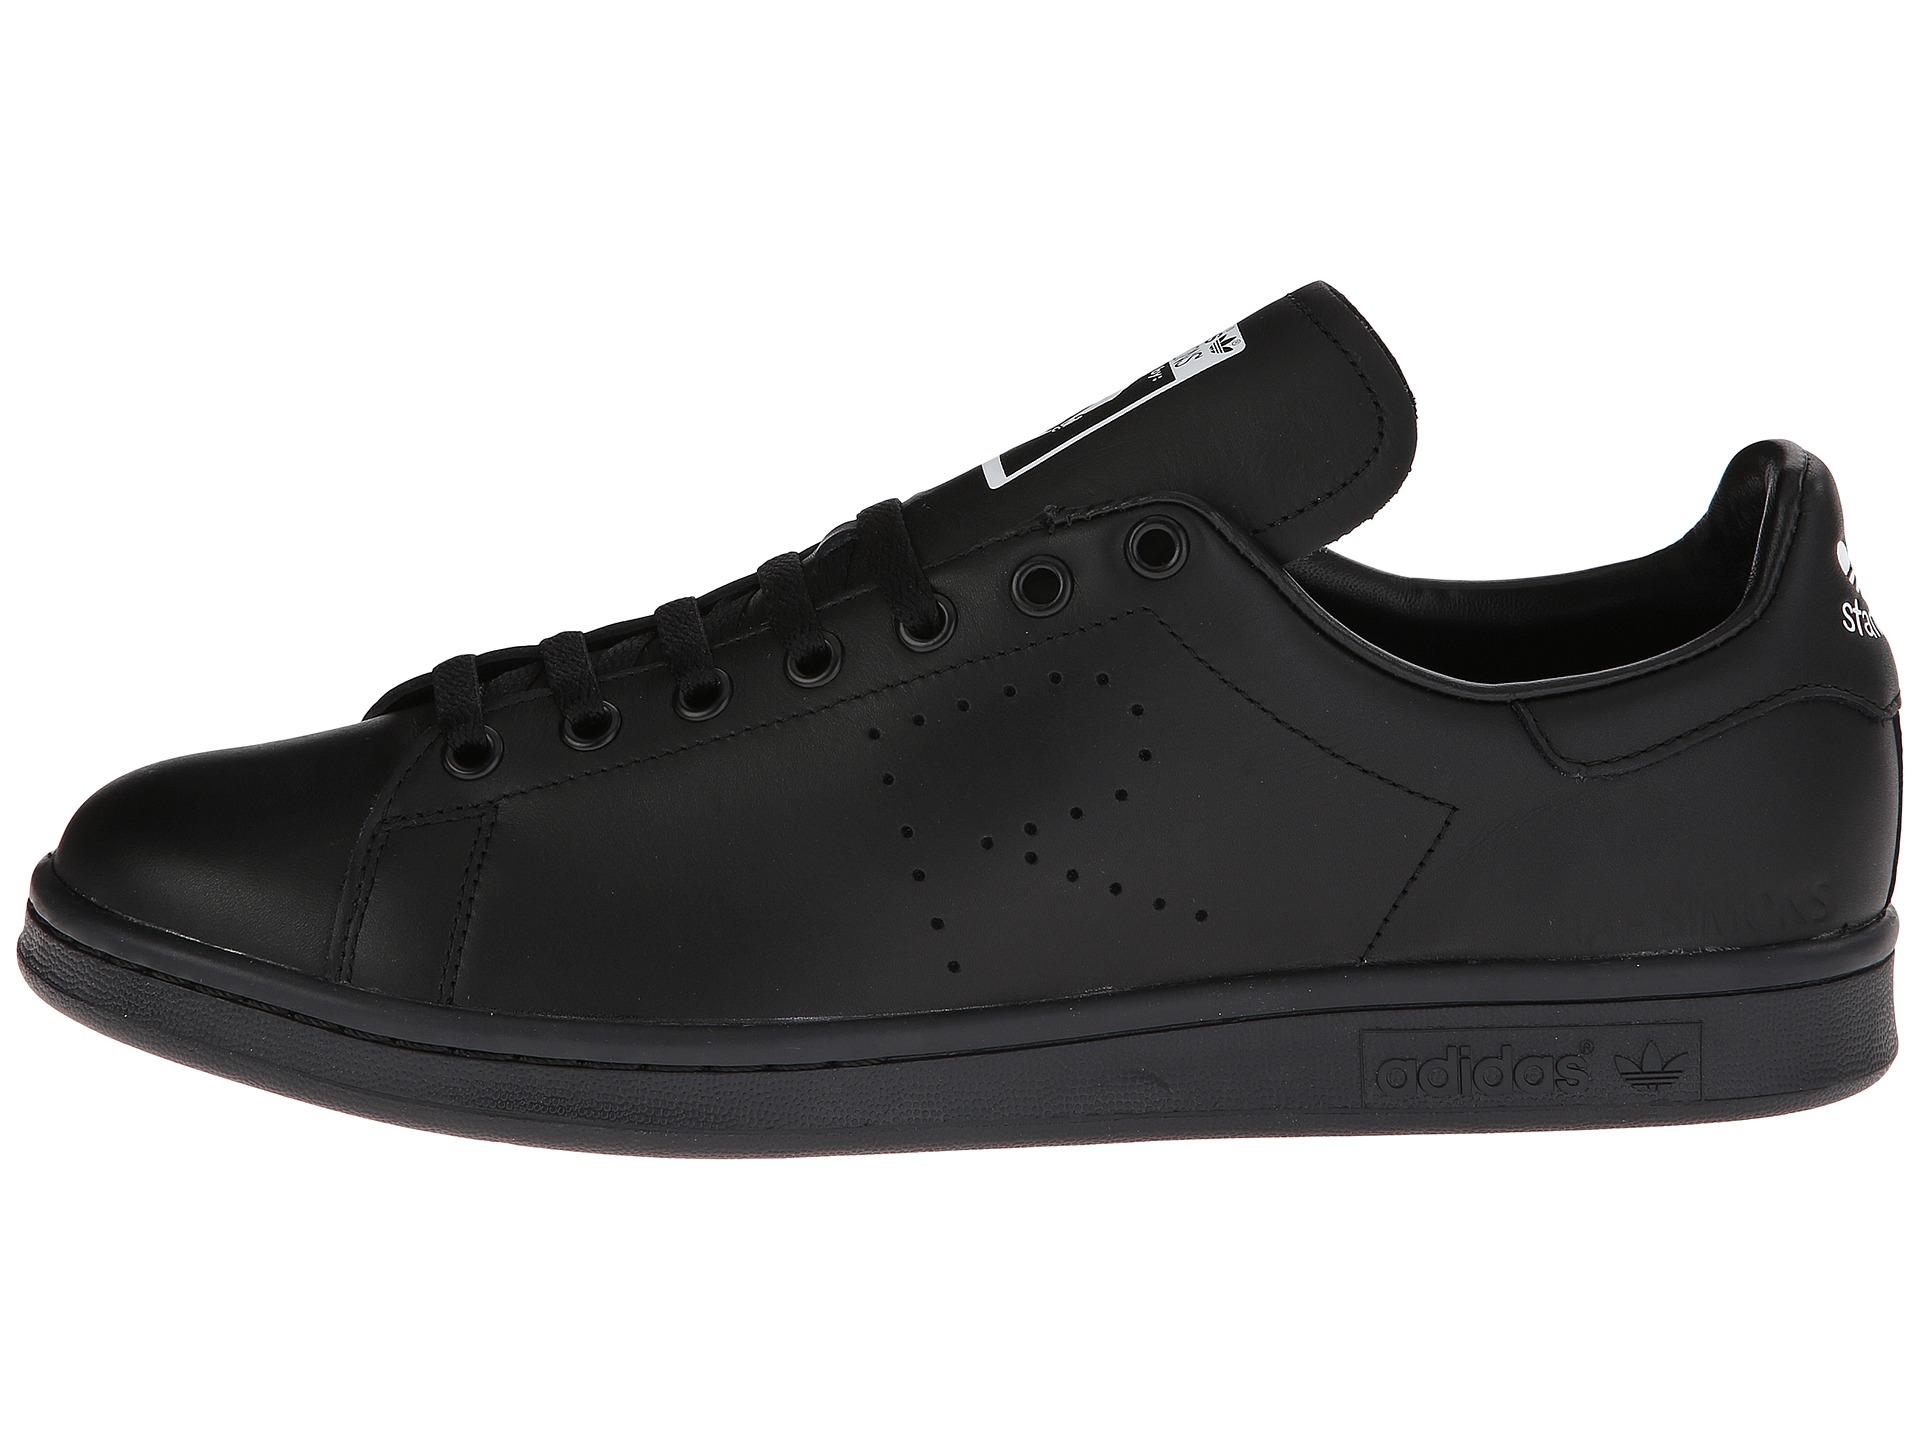 193891e49d14 Lyst - Adidas By Raf Simons Simons Stan Smith in Black